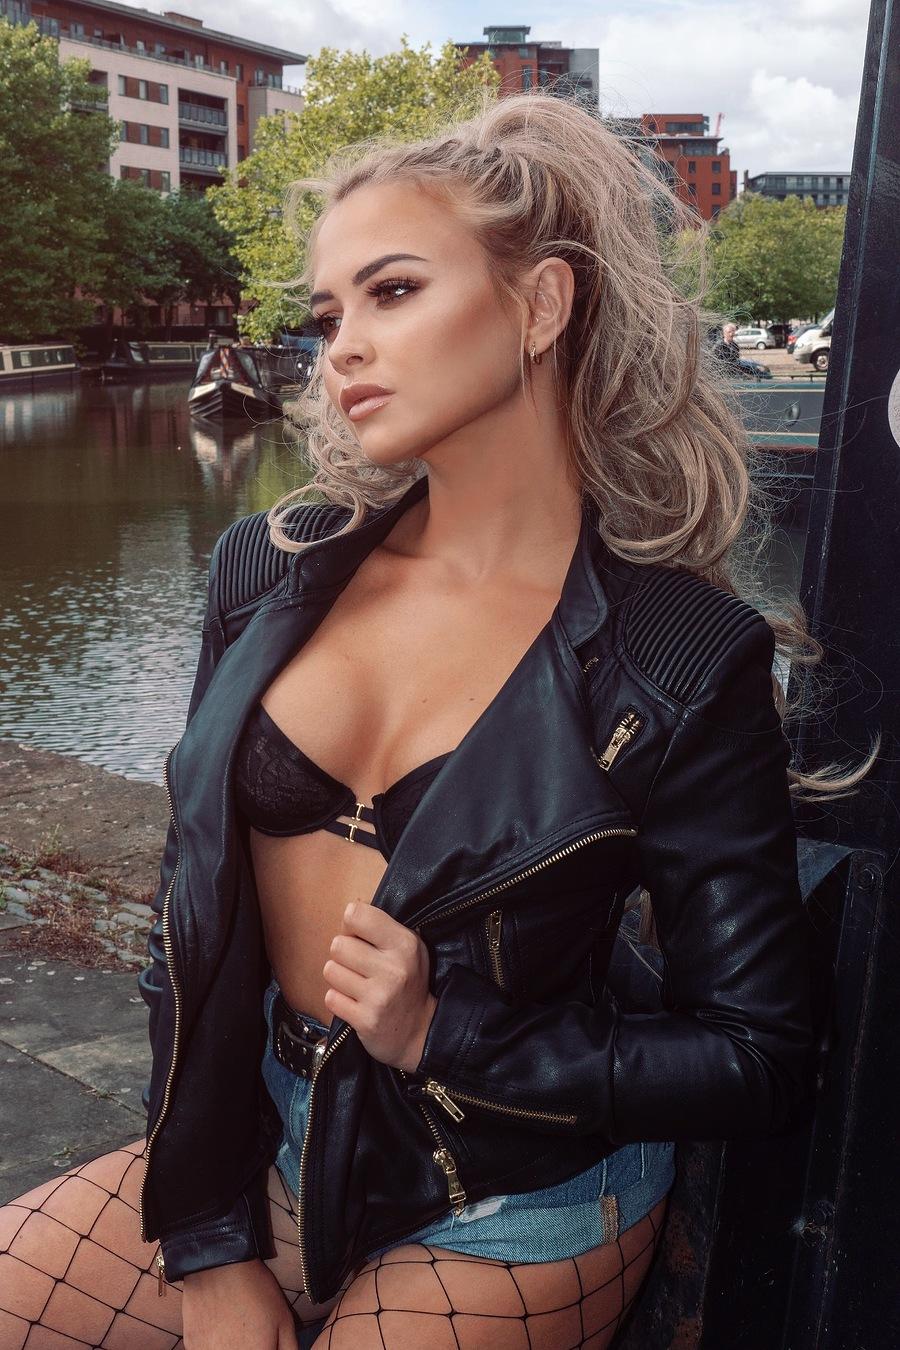 Leather / Model Katie Royle / Uploaded 13th November 2018 @ 08:43 PM